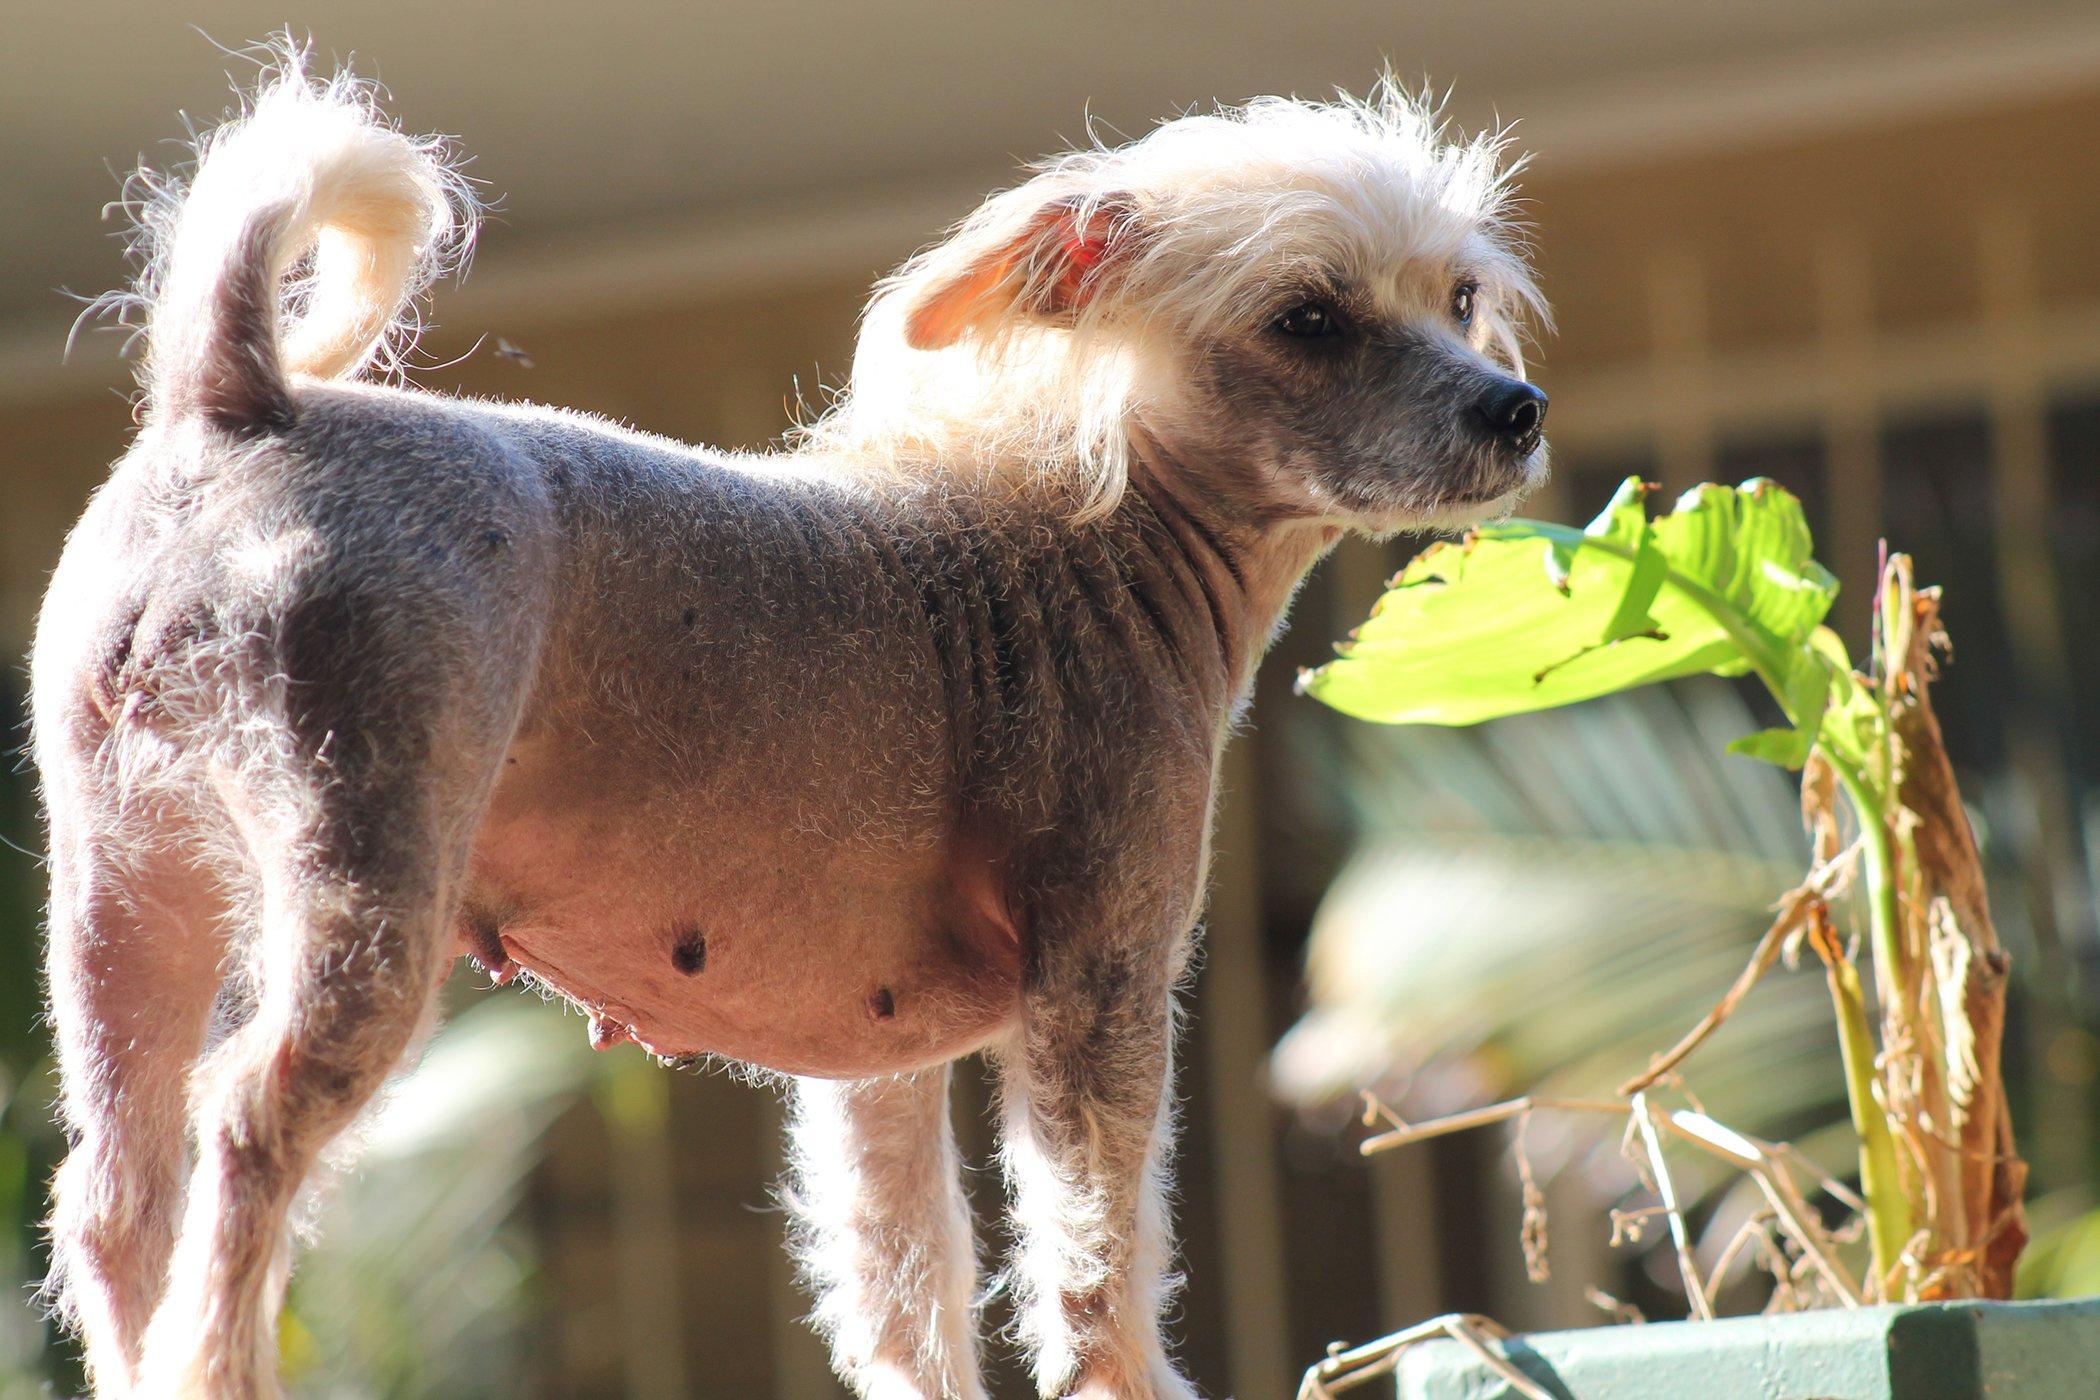 Losing Hair in Dogs